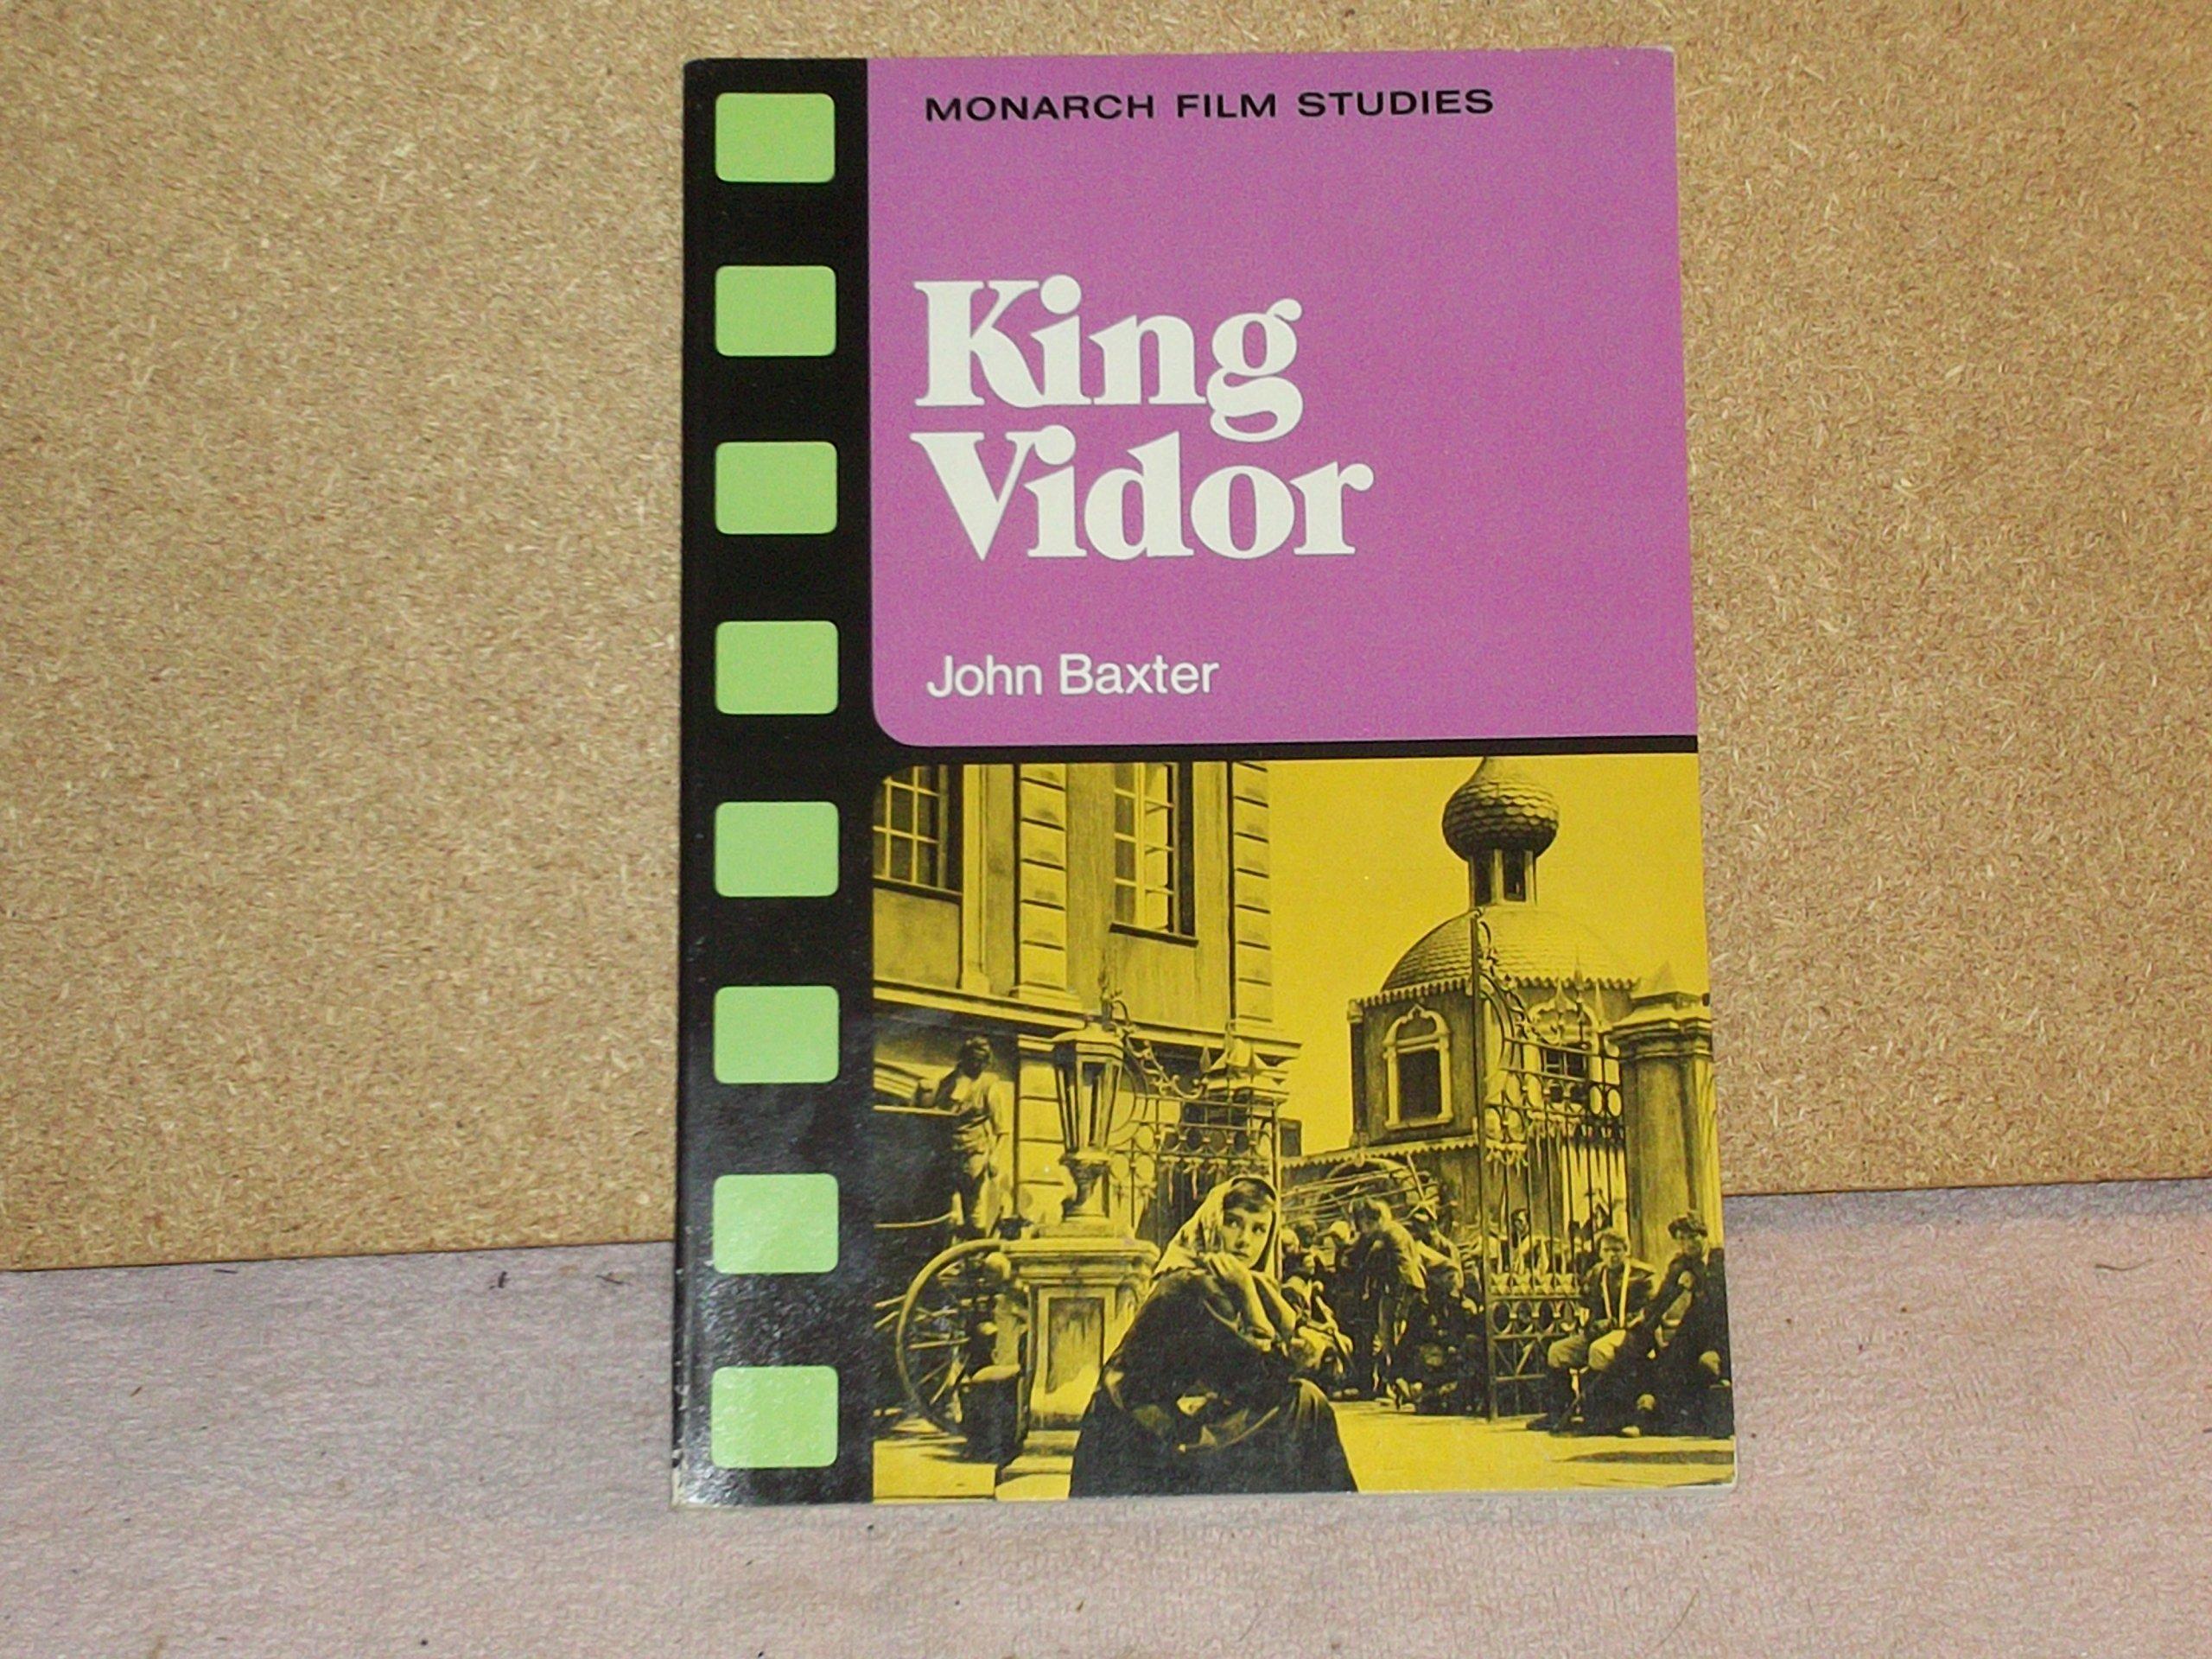 king vidor monarch film studies